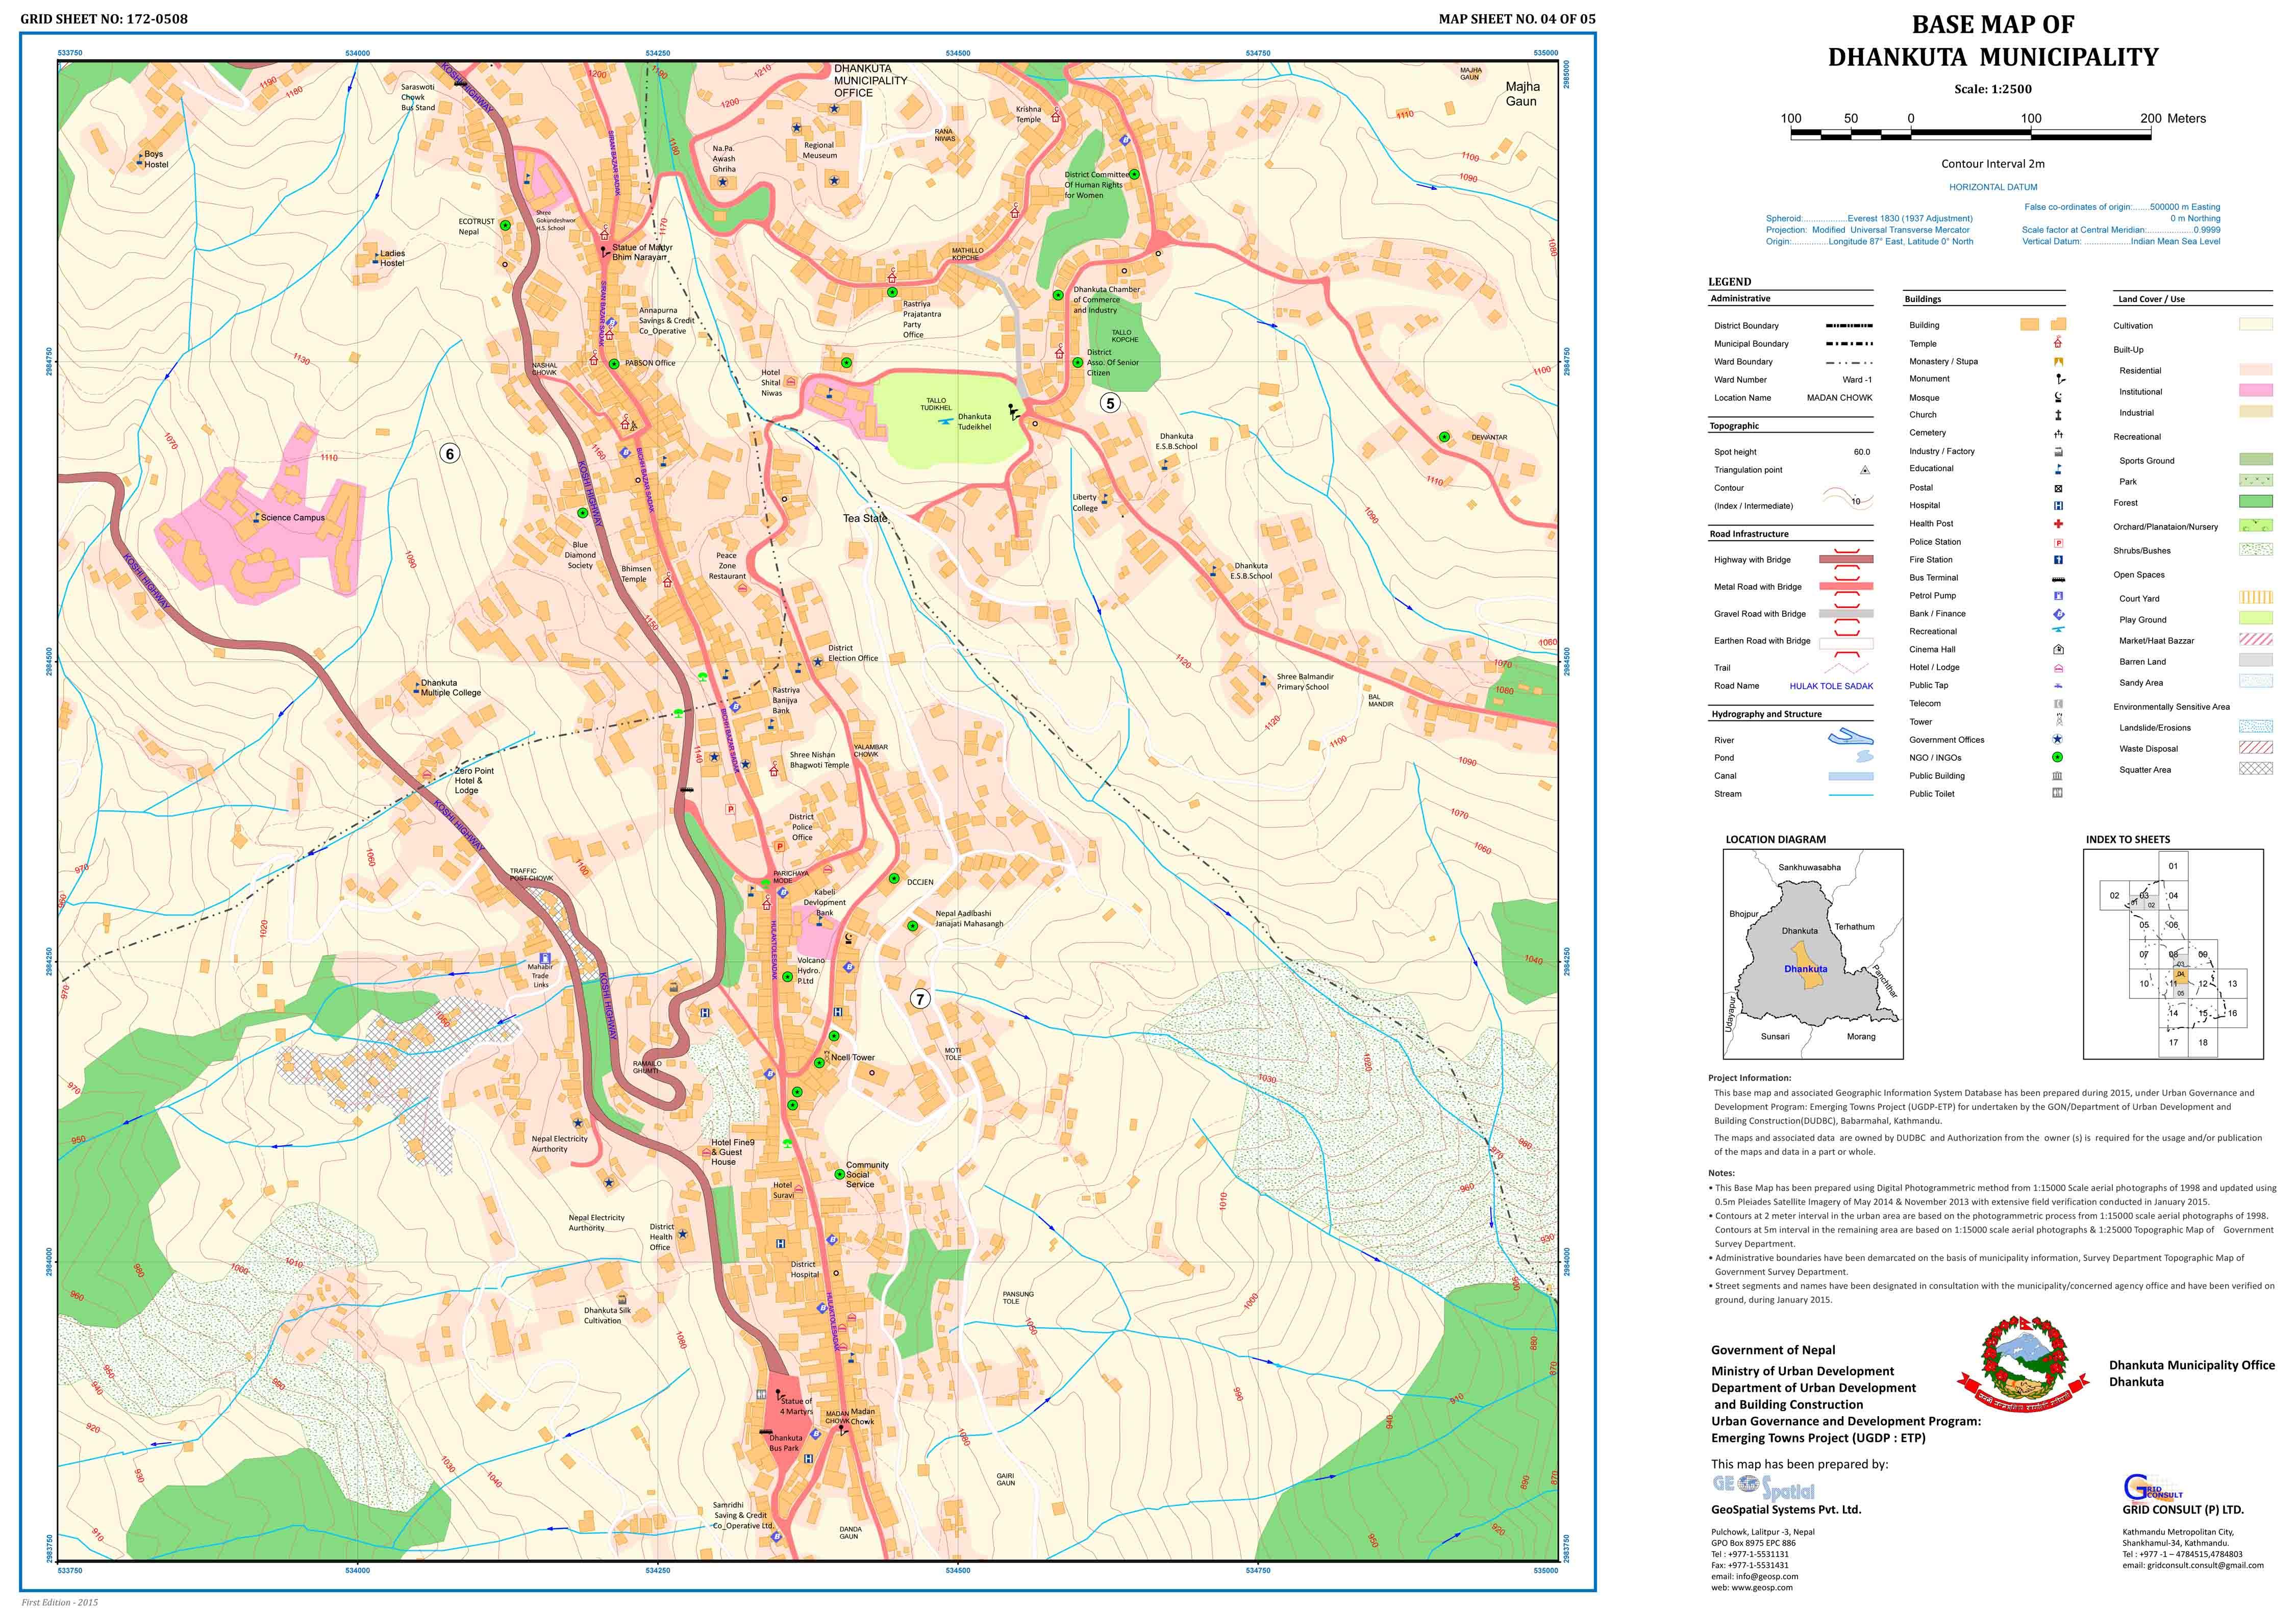 GIS Based Digital Base Map – GeoSpatial Systems Pvt. Ltd. on